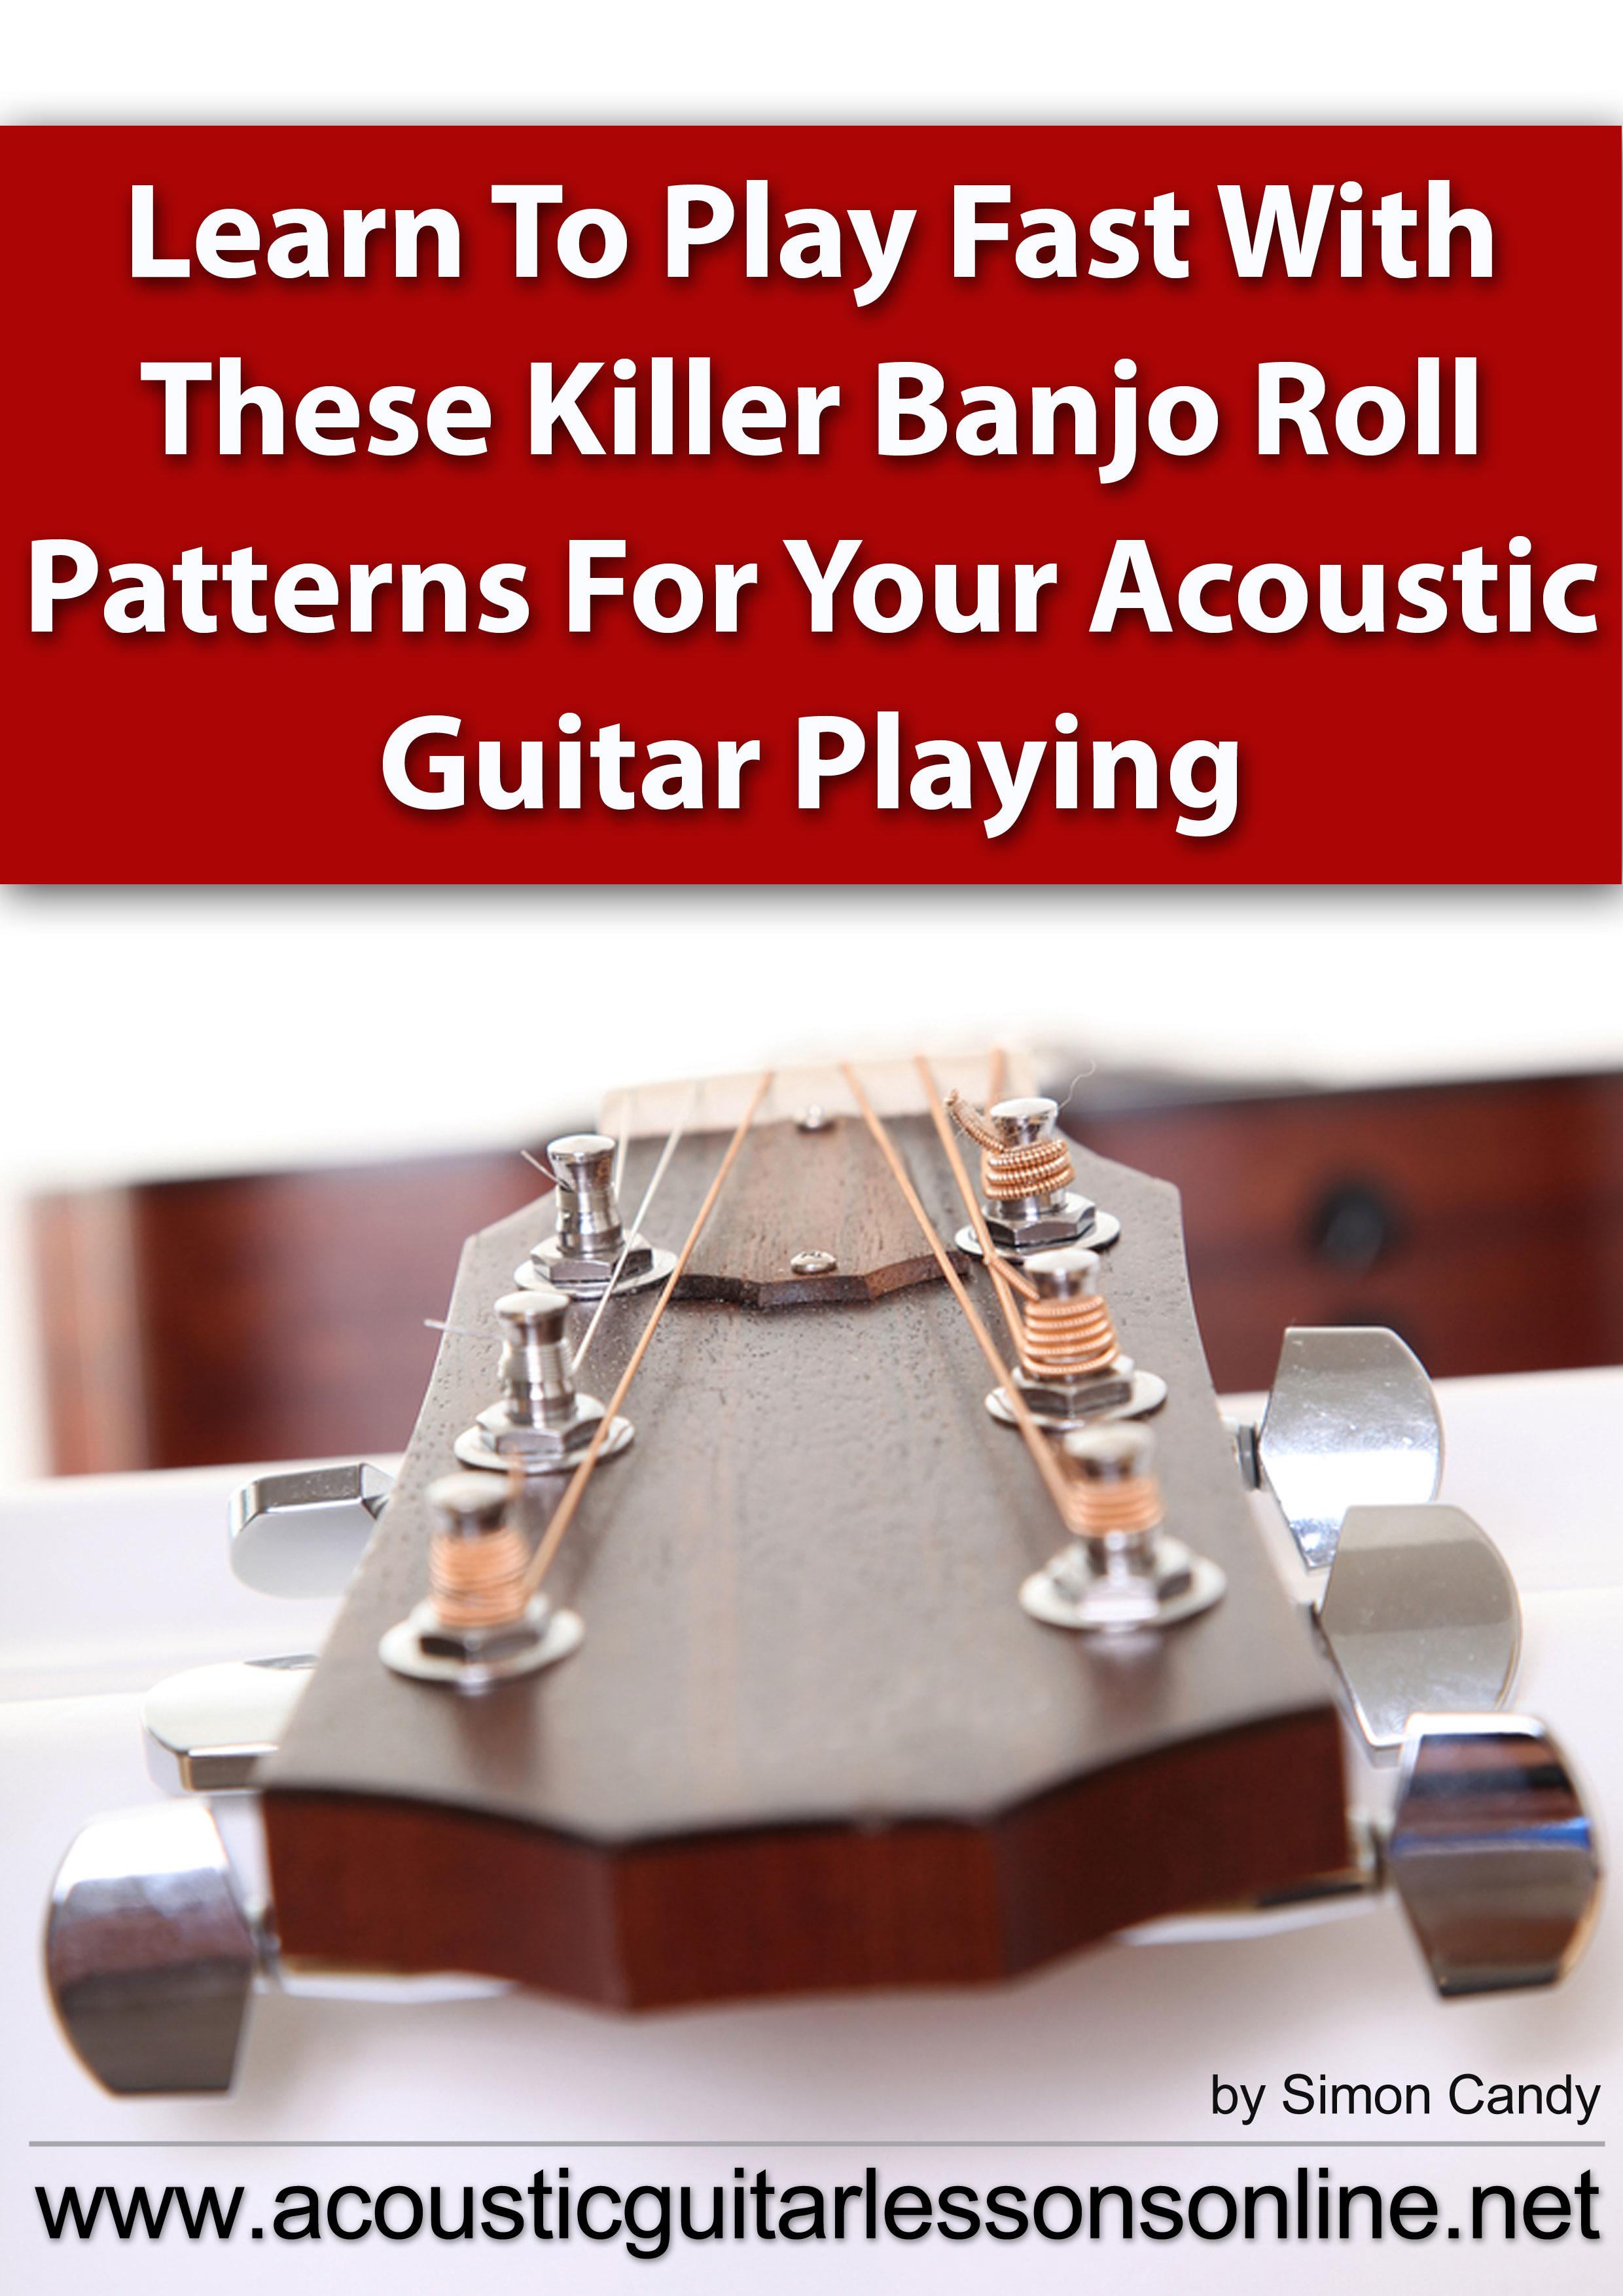 Acoustic-Banjo-Roll